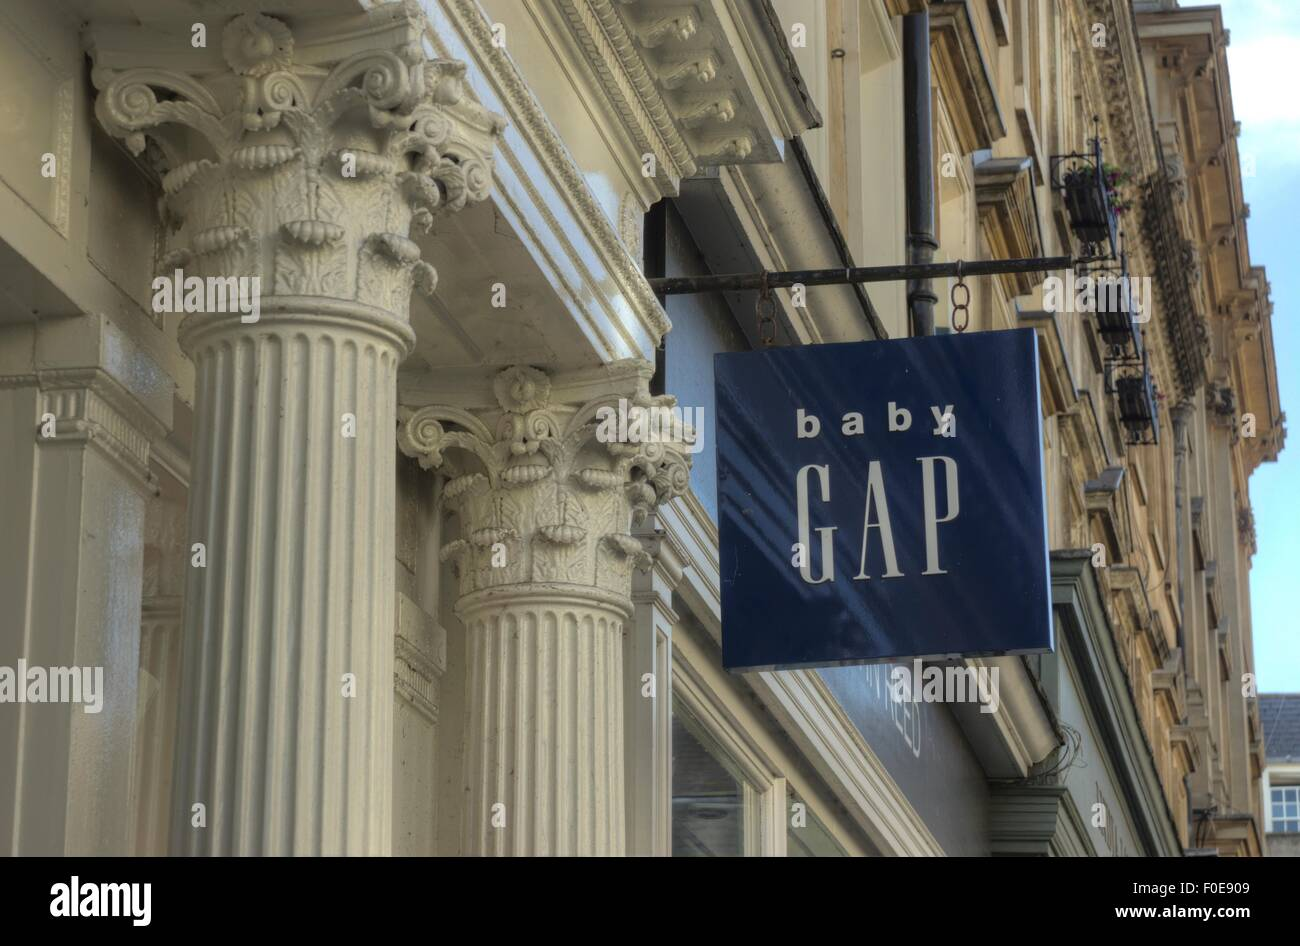 Baby Gap shop Bath England Stock Photo: 86366233 - Alamy